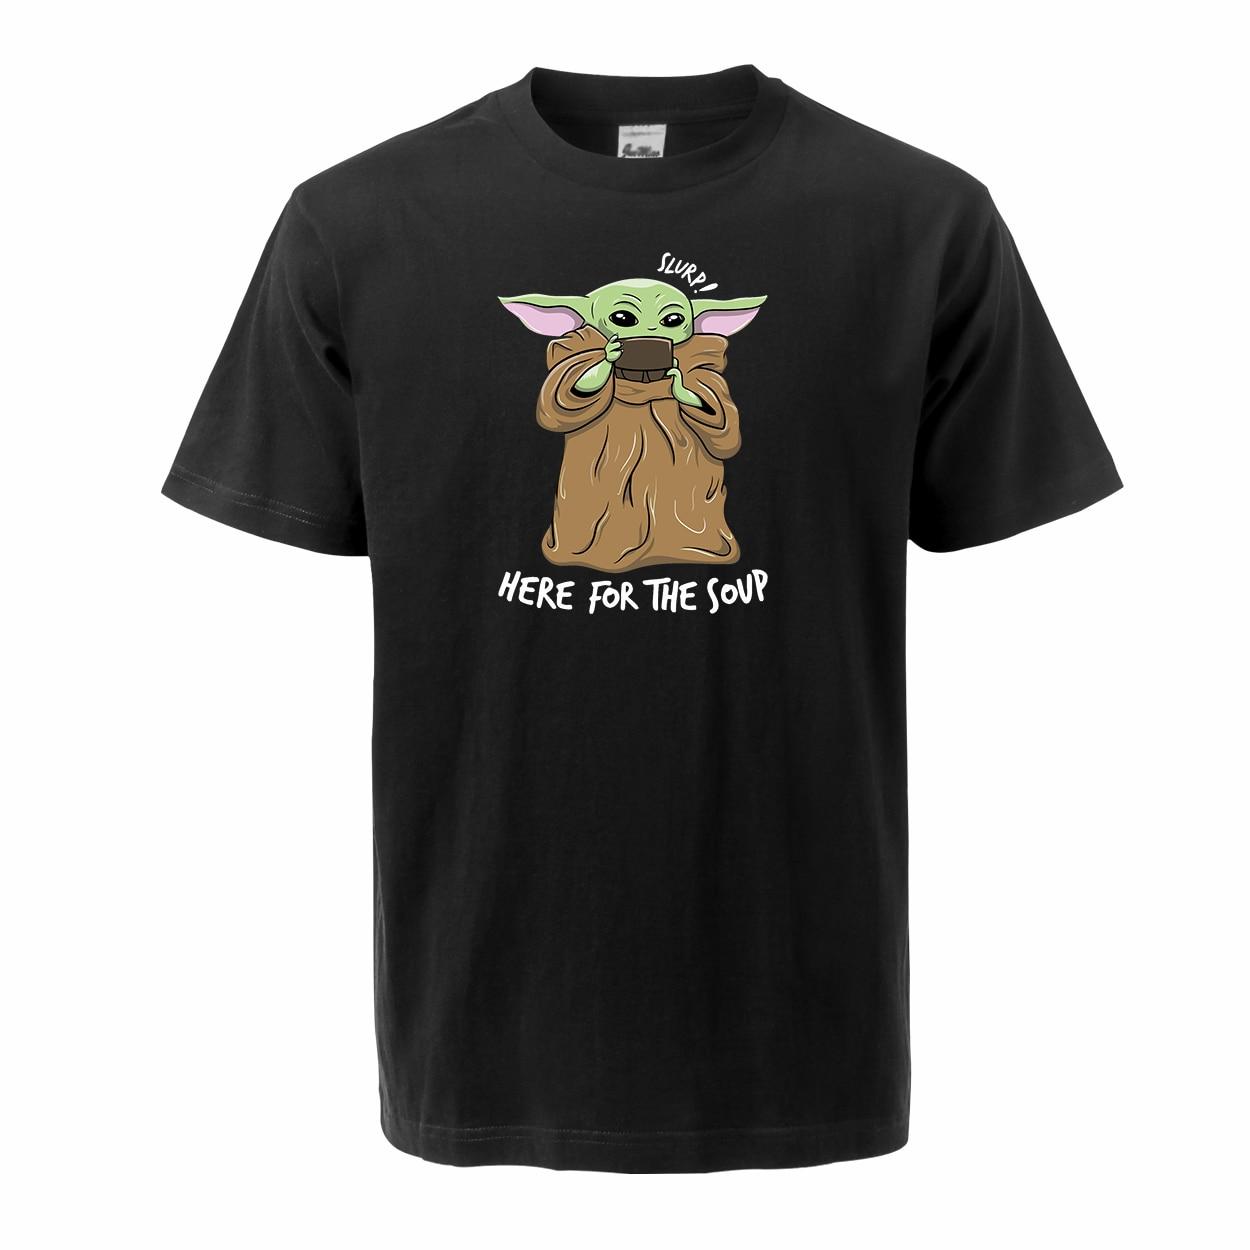 Cute Baby Yoda Men T Shirts 2020 Summer Tops Tee 100% Cotton Short Sleeve Crew Neck T-shirts The Mandalorian Star War Streetwear